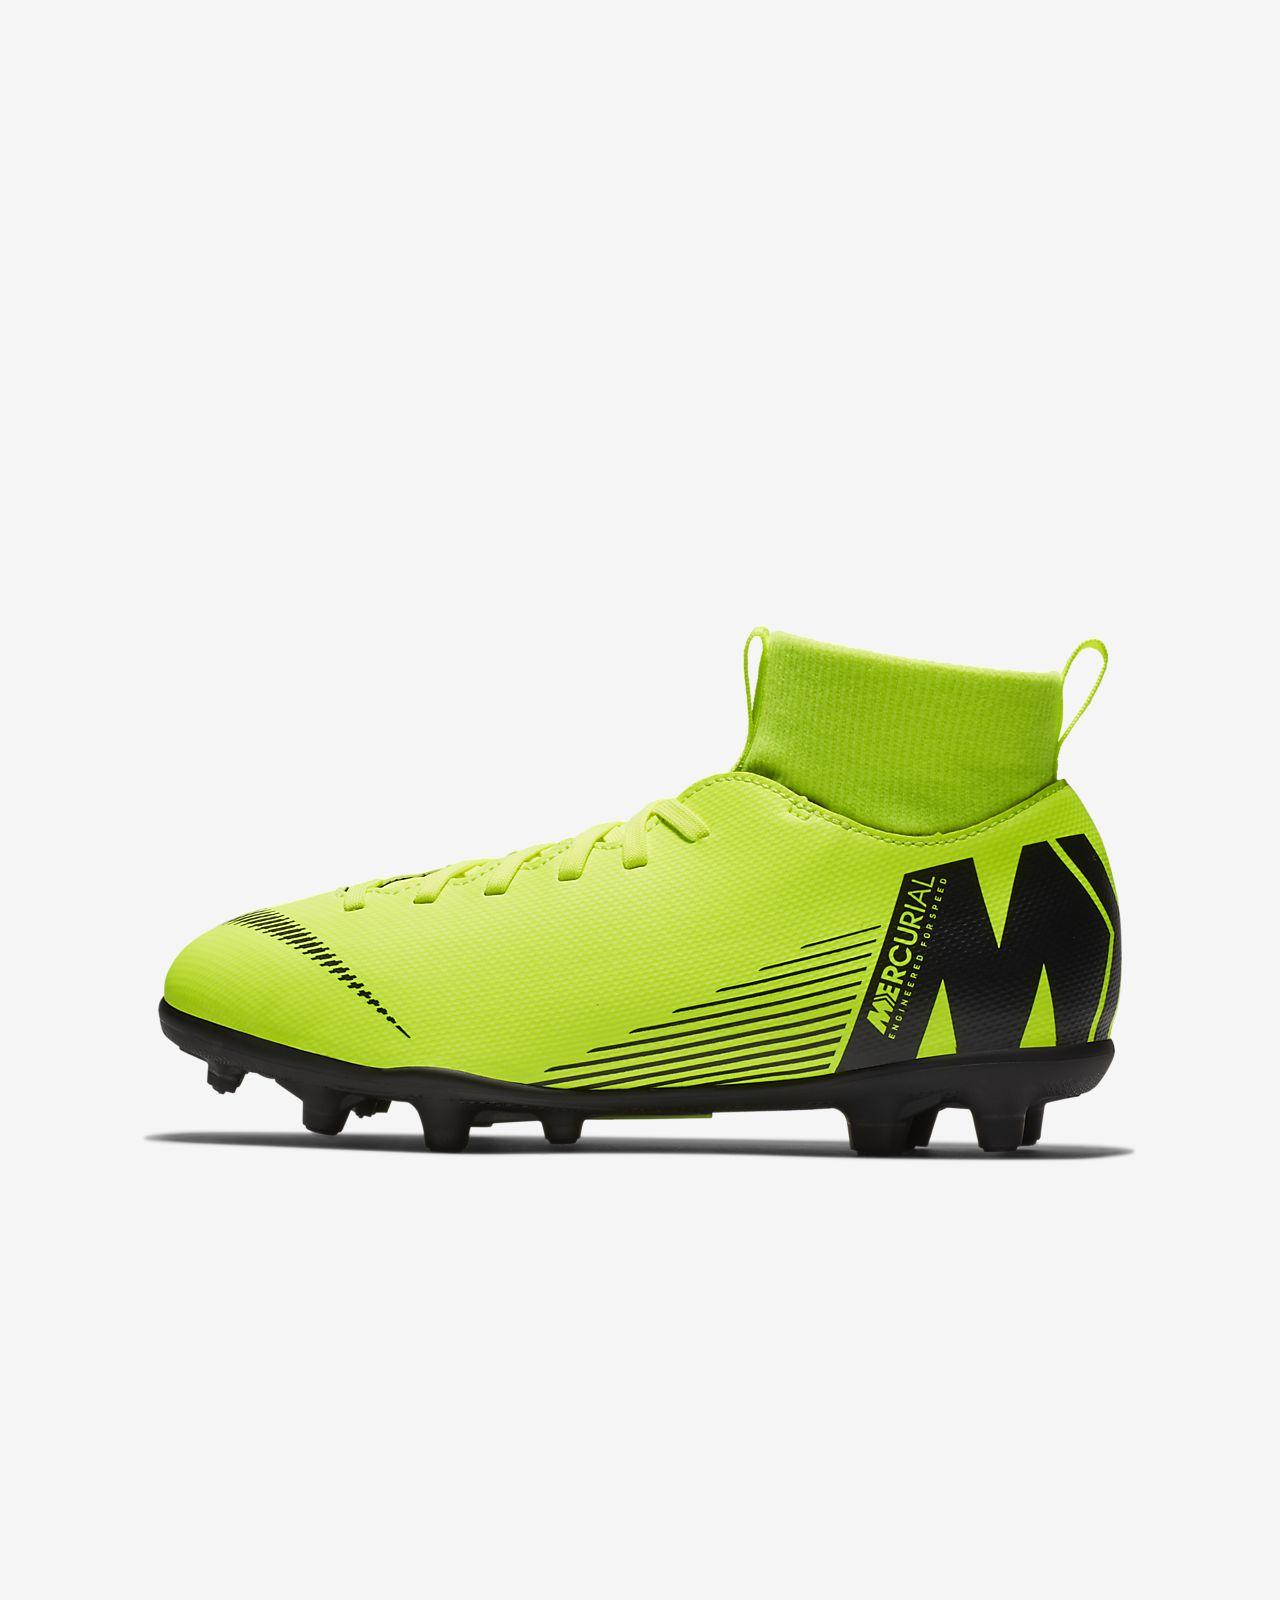 22048cf08d060 ... Chaussure de football multi-terrains à crampons Nike Jr. Mercurial  Superfly VI Club pour